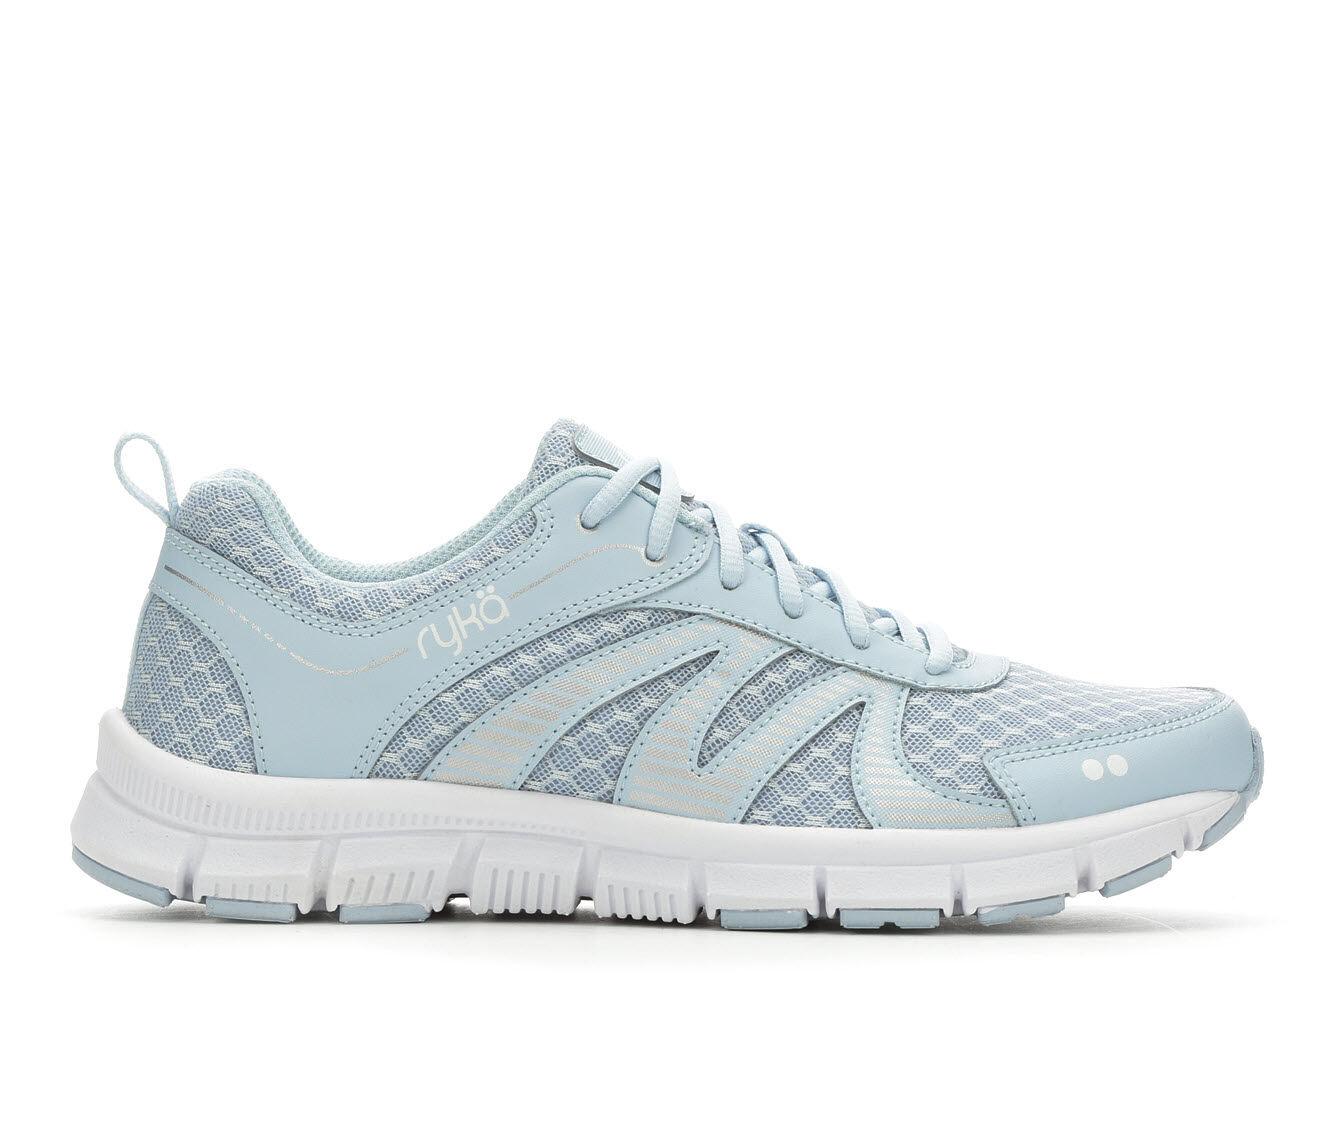 Women's Ryka Heather Training Shoes Soft Blue/White